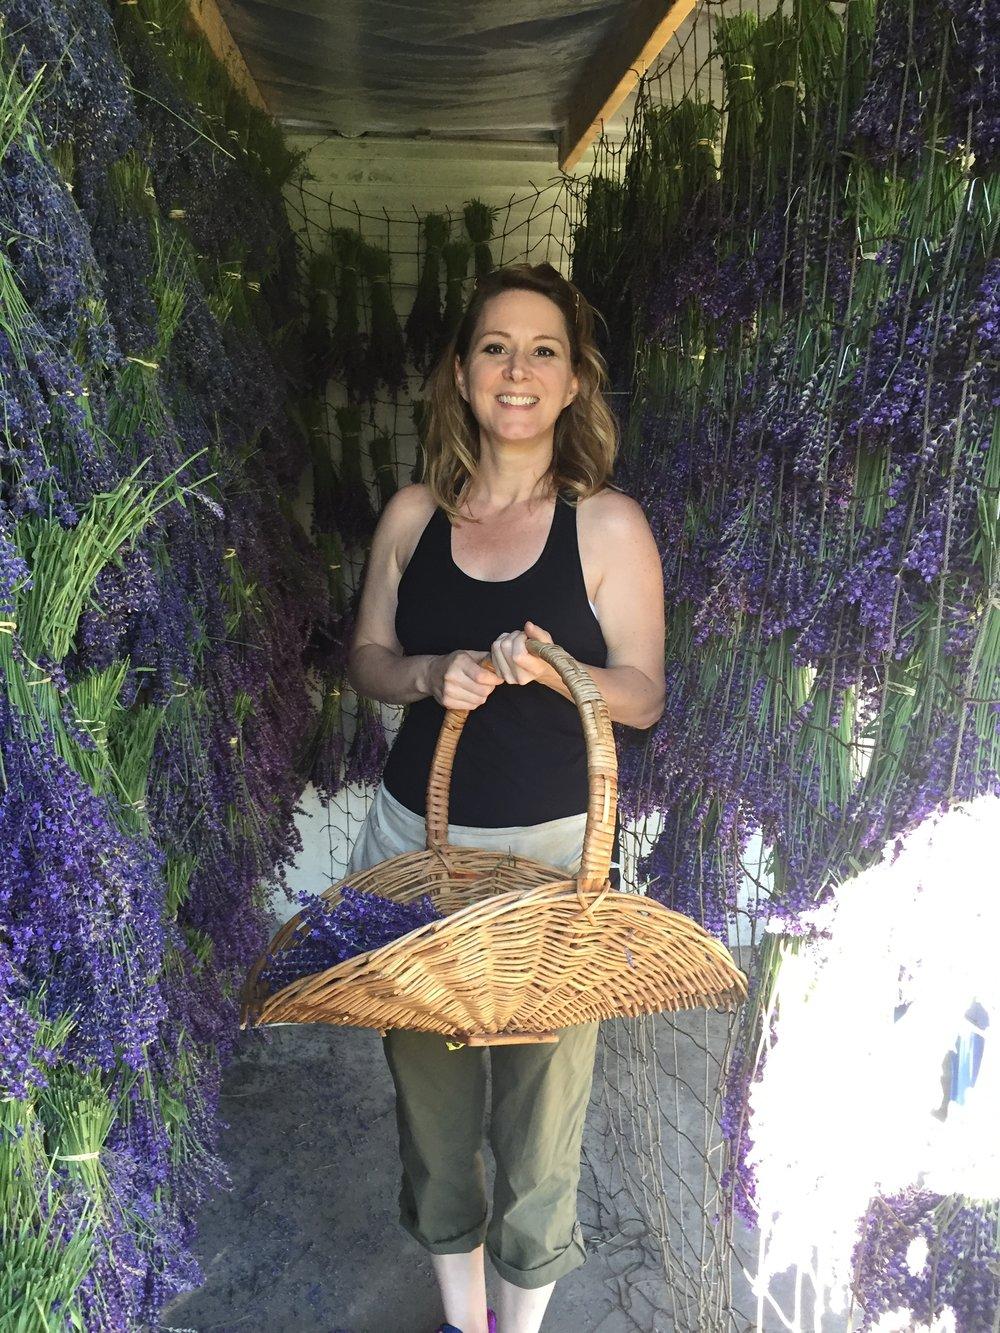 Enjoying the wonderful lavender in Woodinville!